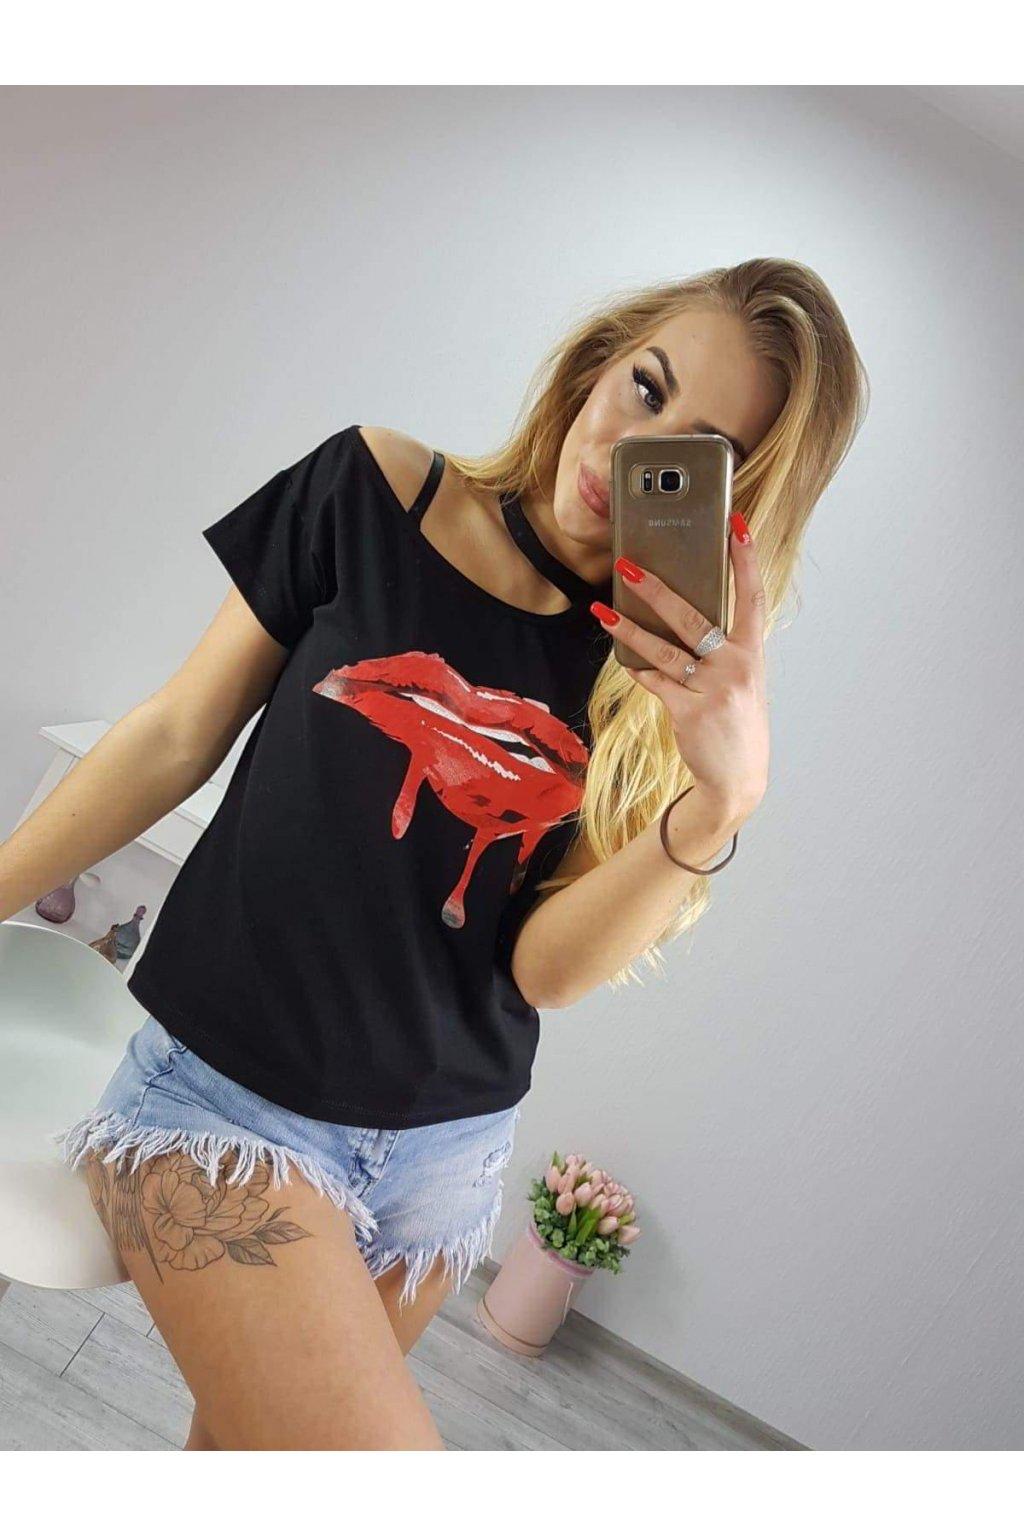 Damské tričko Kiss černé